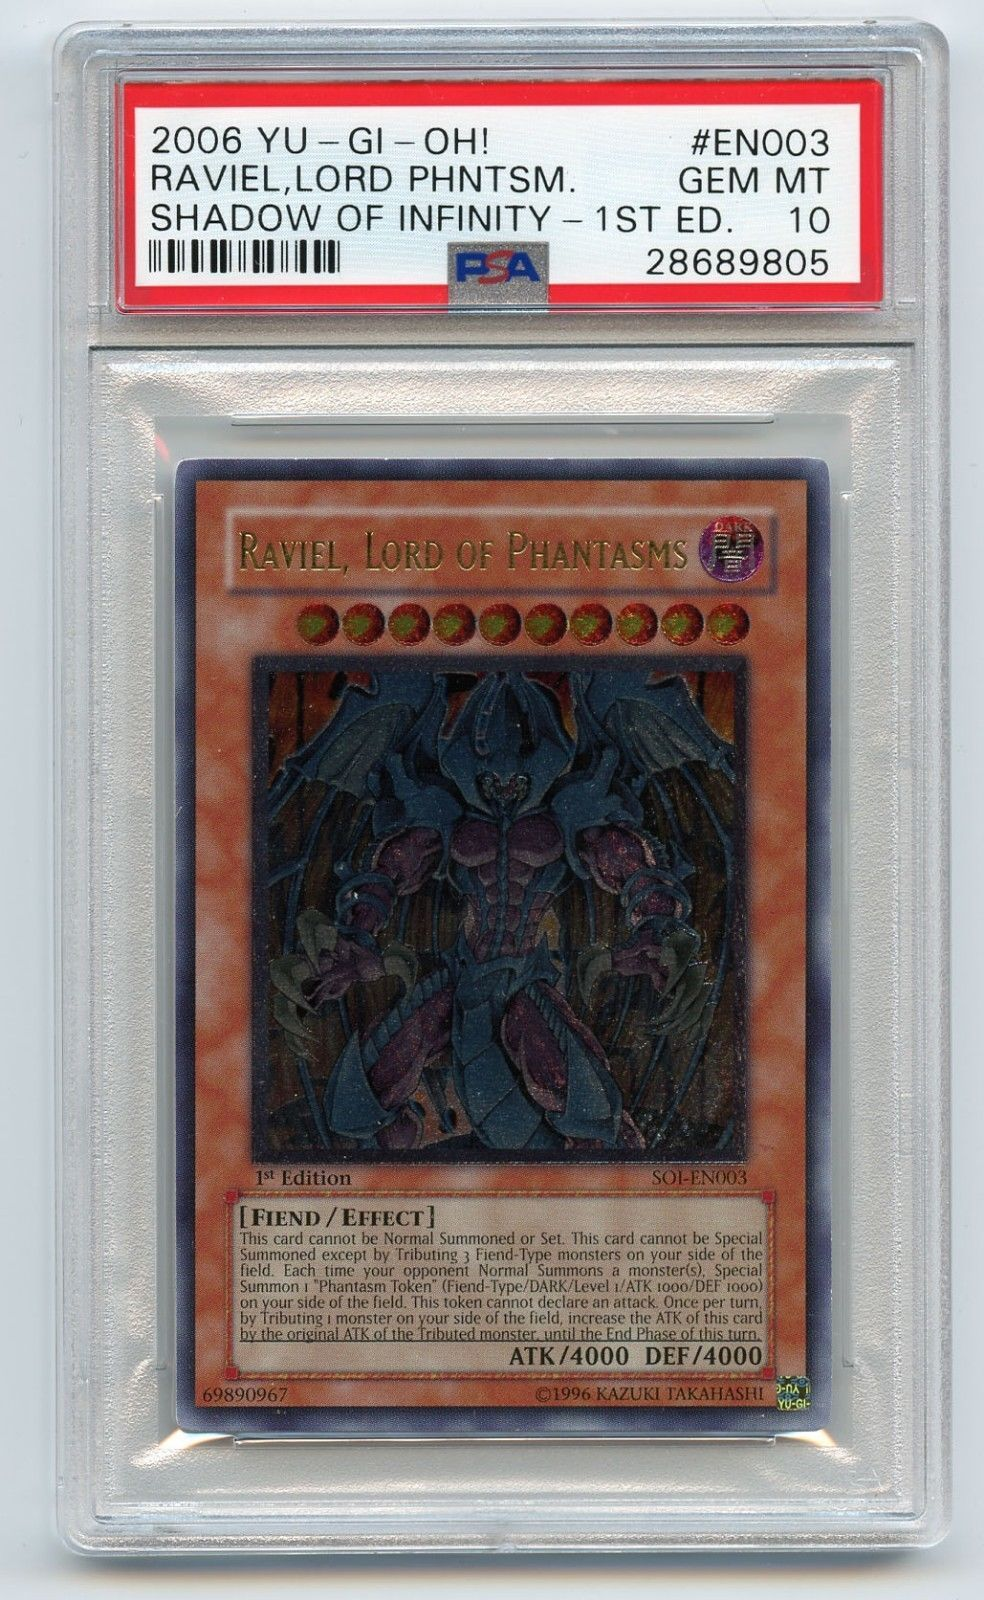 Raviel Lord Of Phantasms Secret Rare Limited Edition